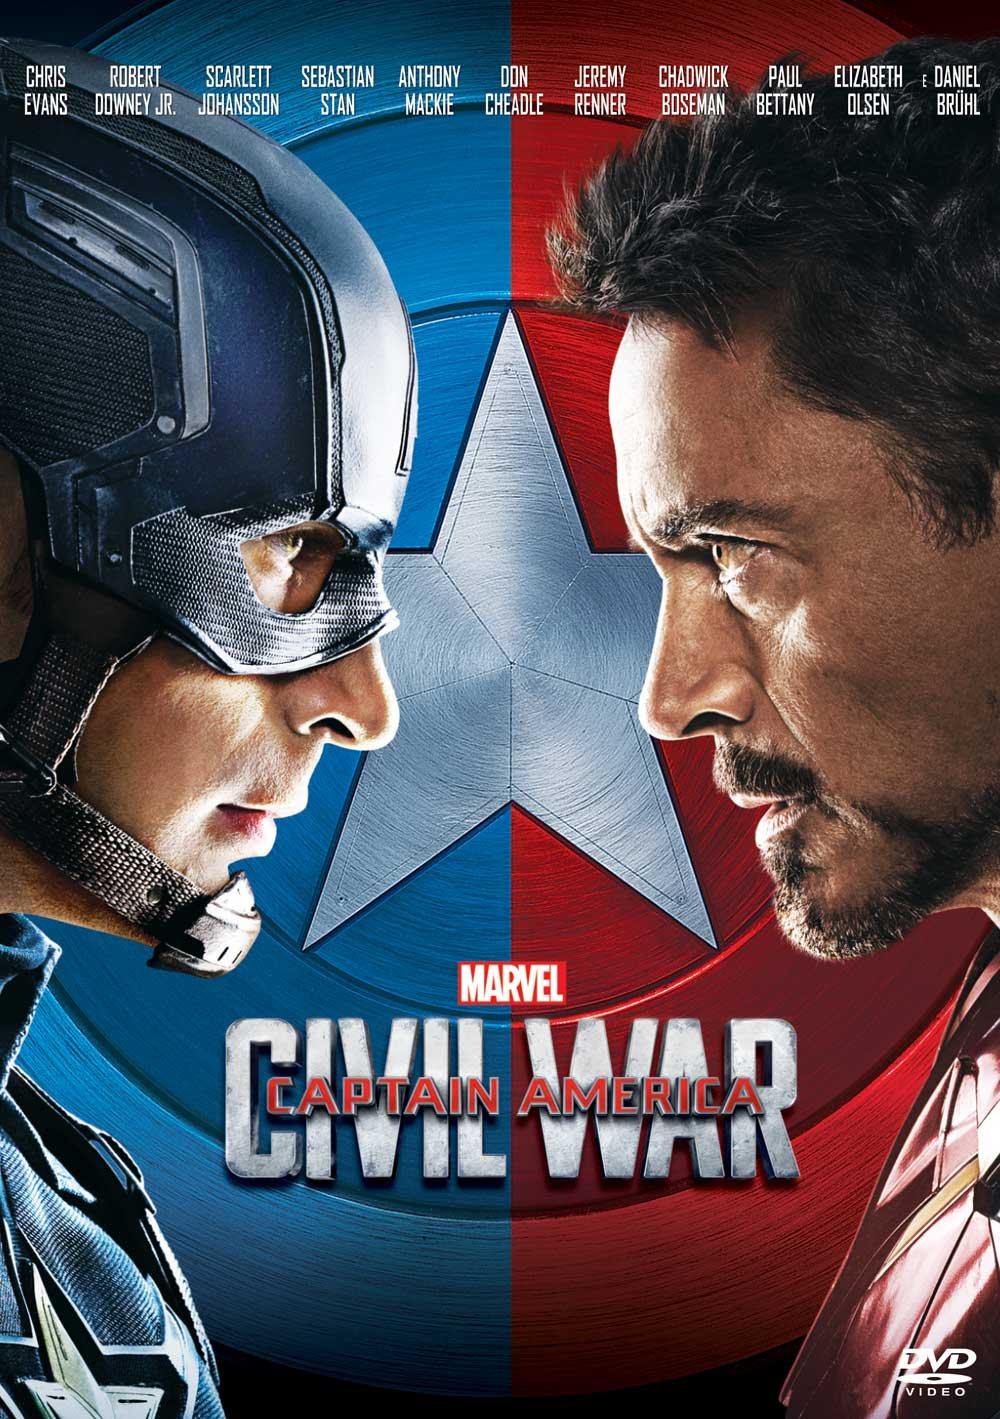 CAPTAIN MARVEL   CIVIL WAR   DOWNEY JR ROBERT   EVANS CHRIS ...